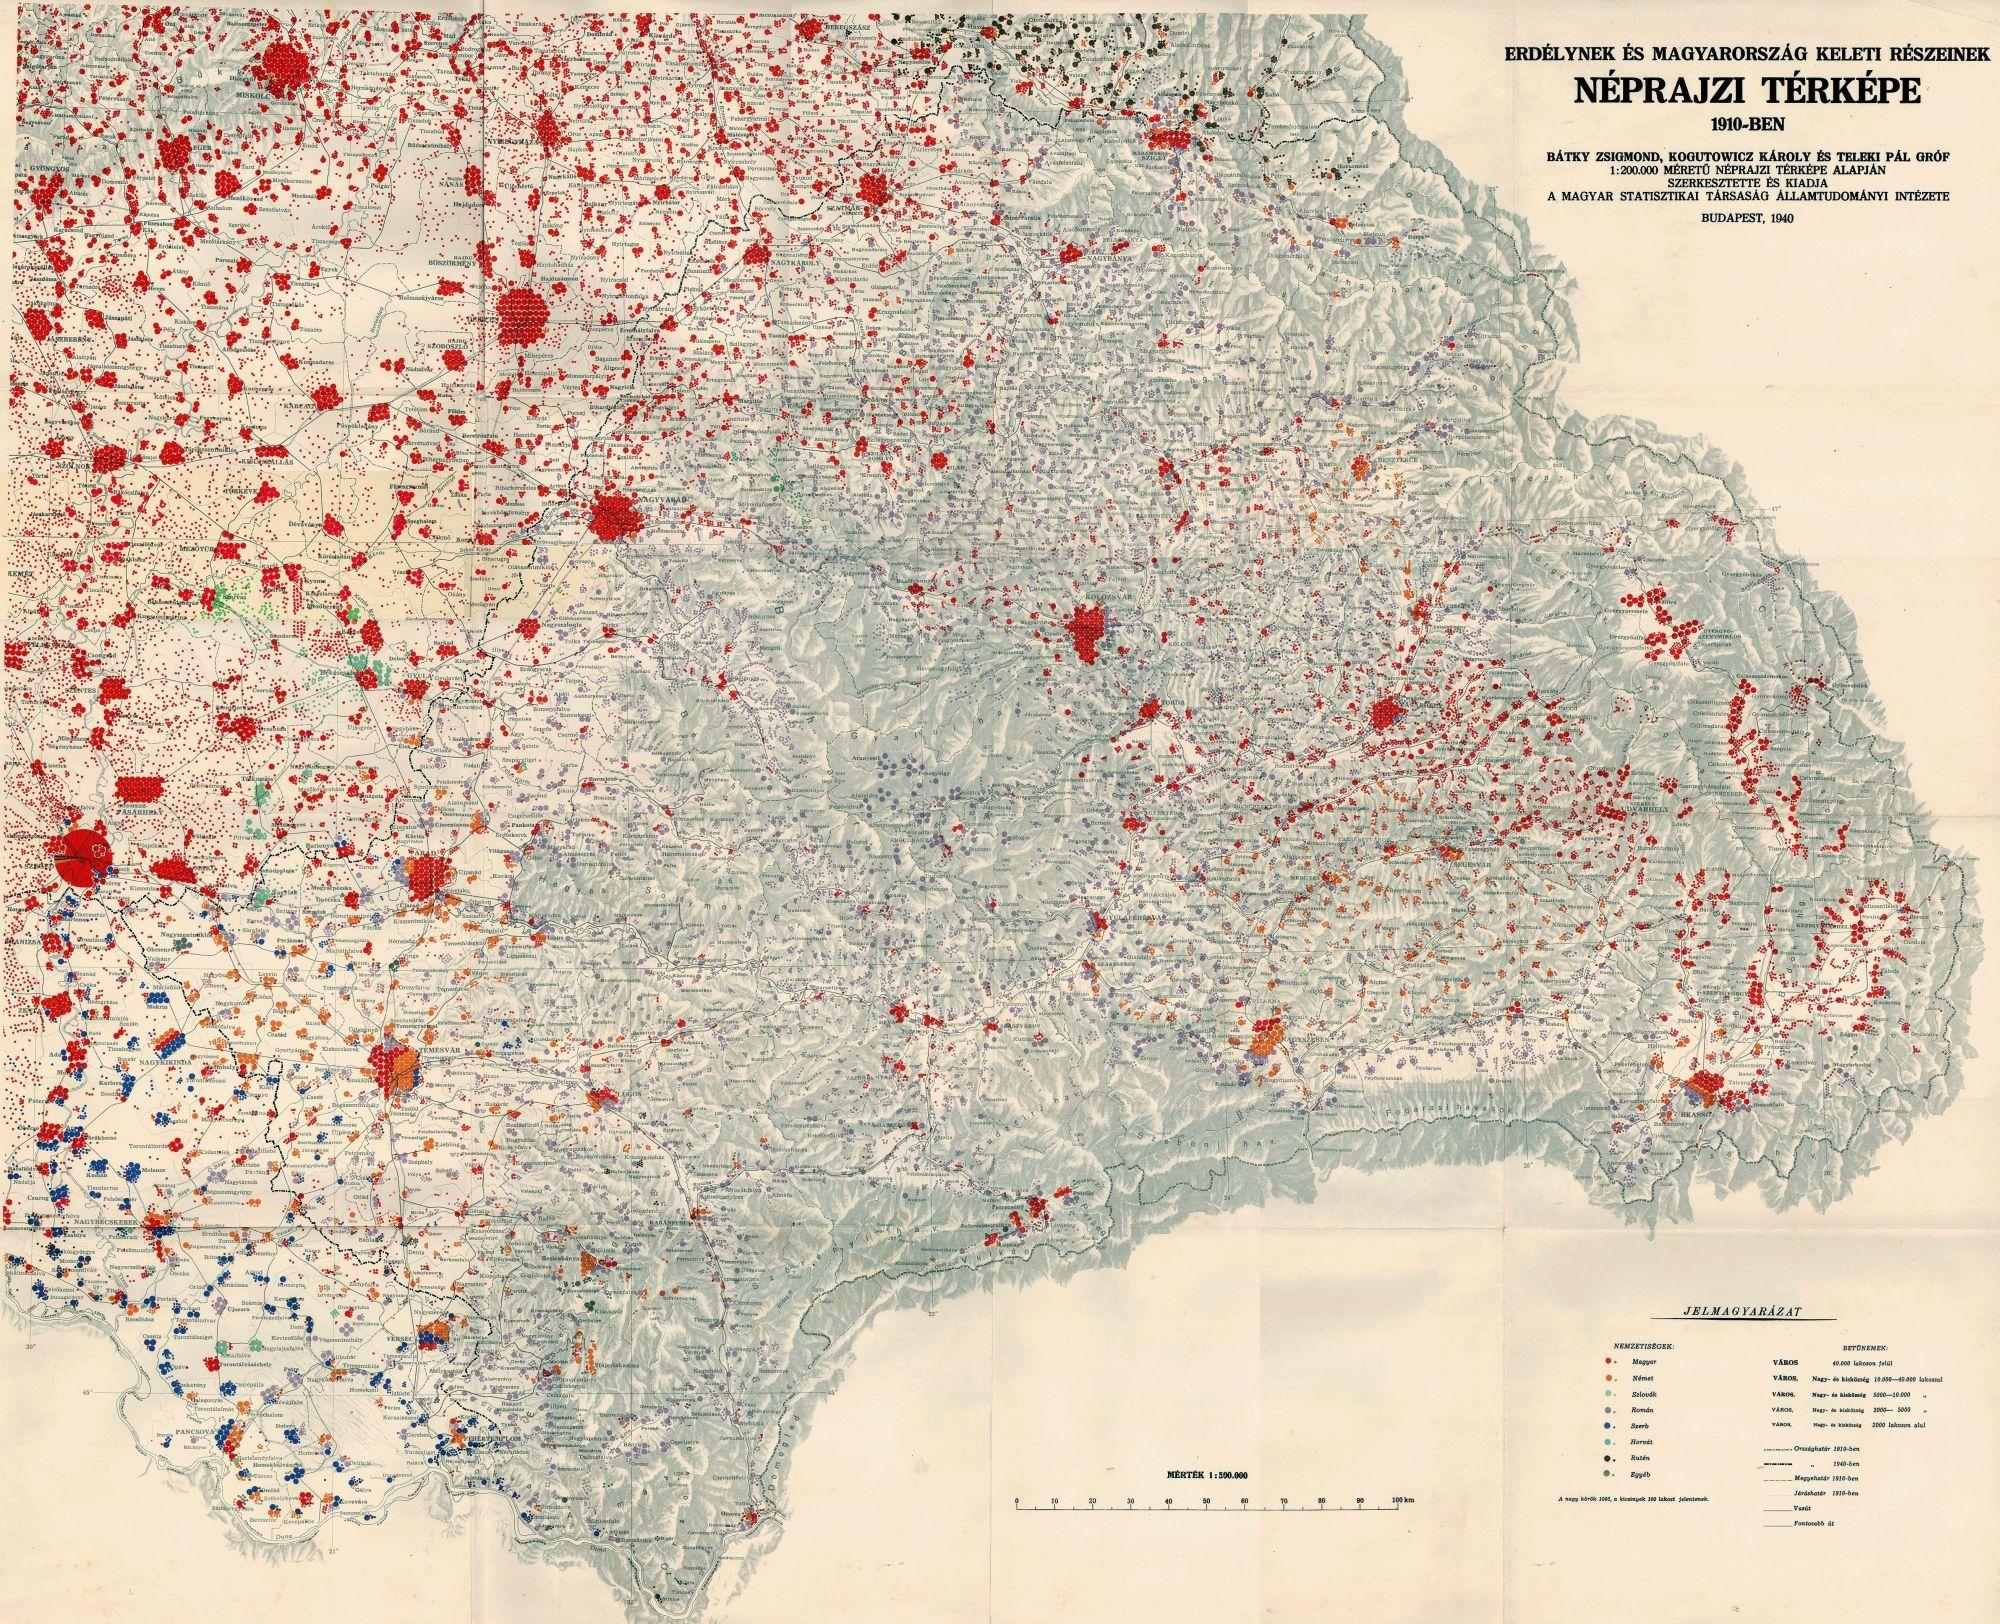 Ethnic map of 1910 transylvania an eastern hungary budapest 1940 ethnic map of 1910 transylvania an eastern hungary budapest 1940 gumiabroncs Choice Image